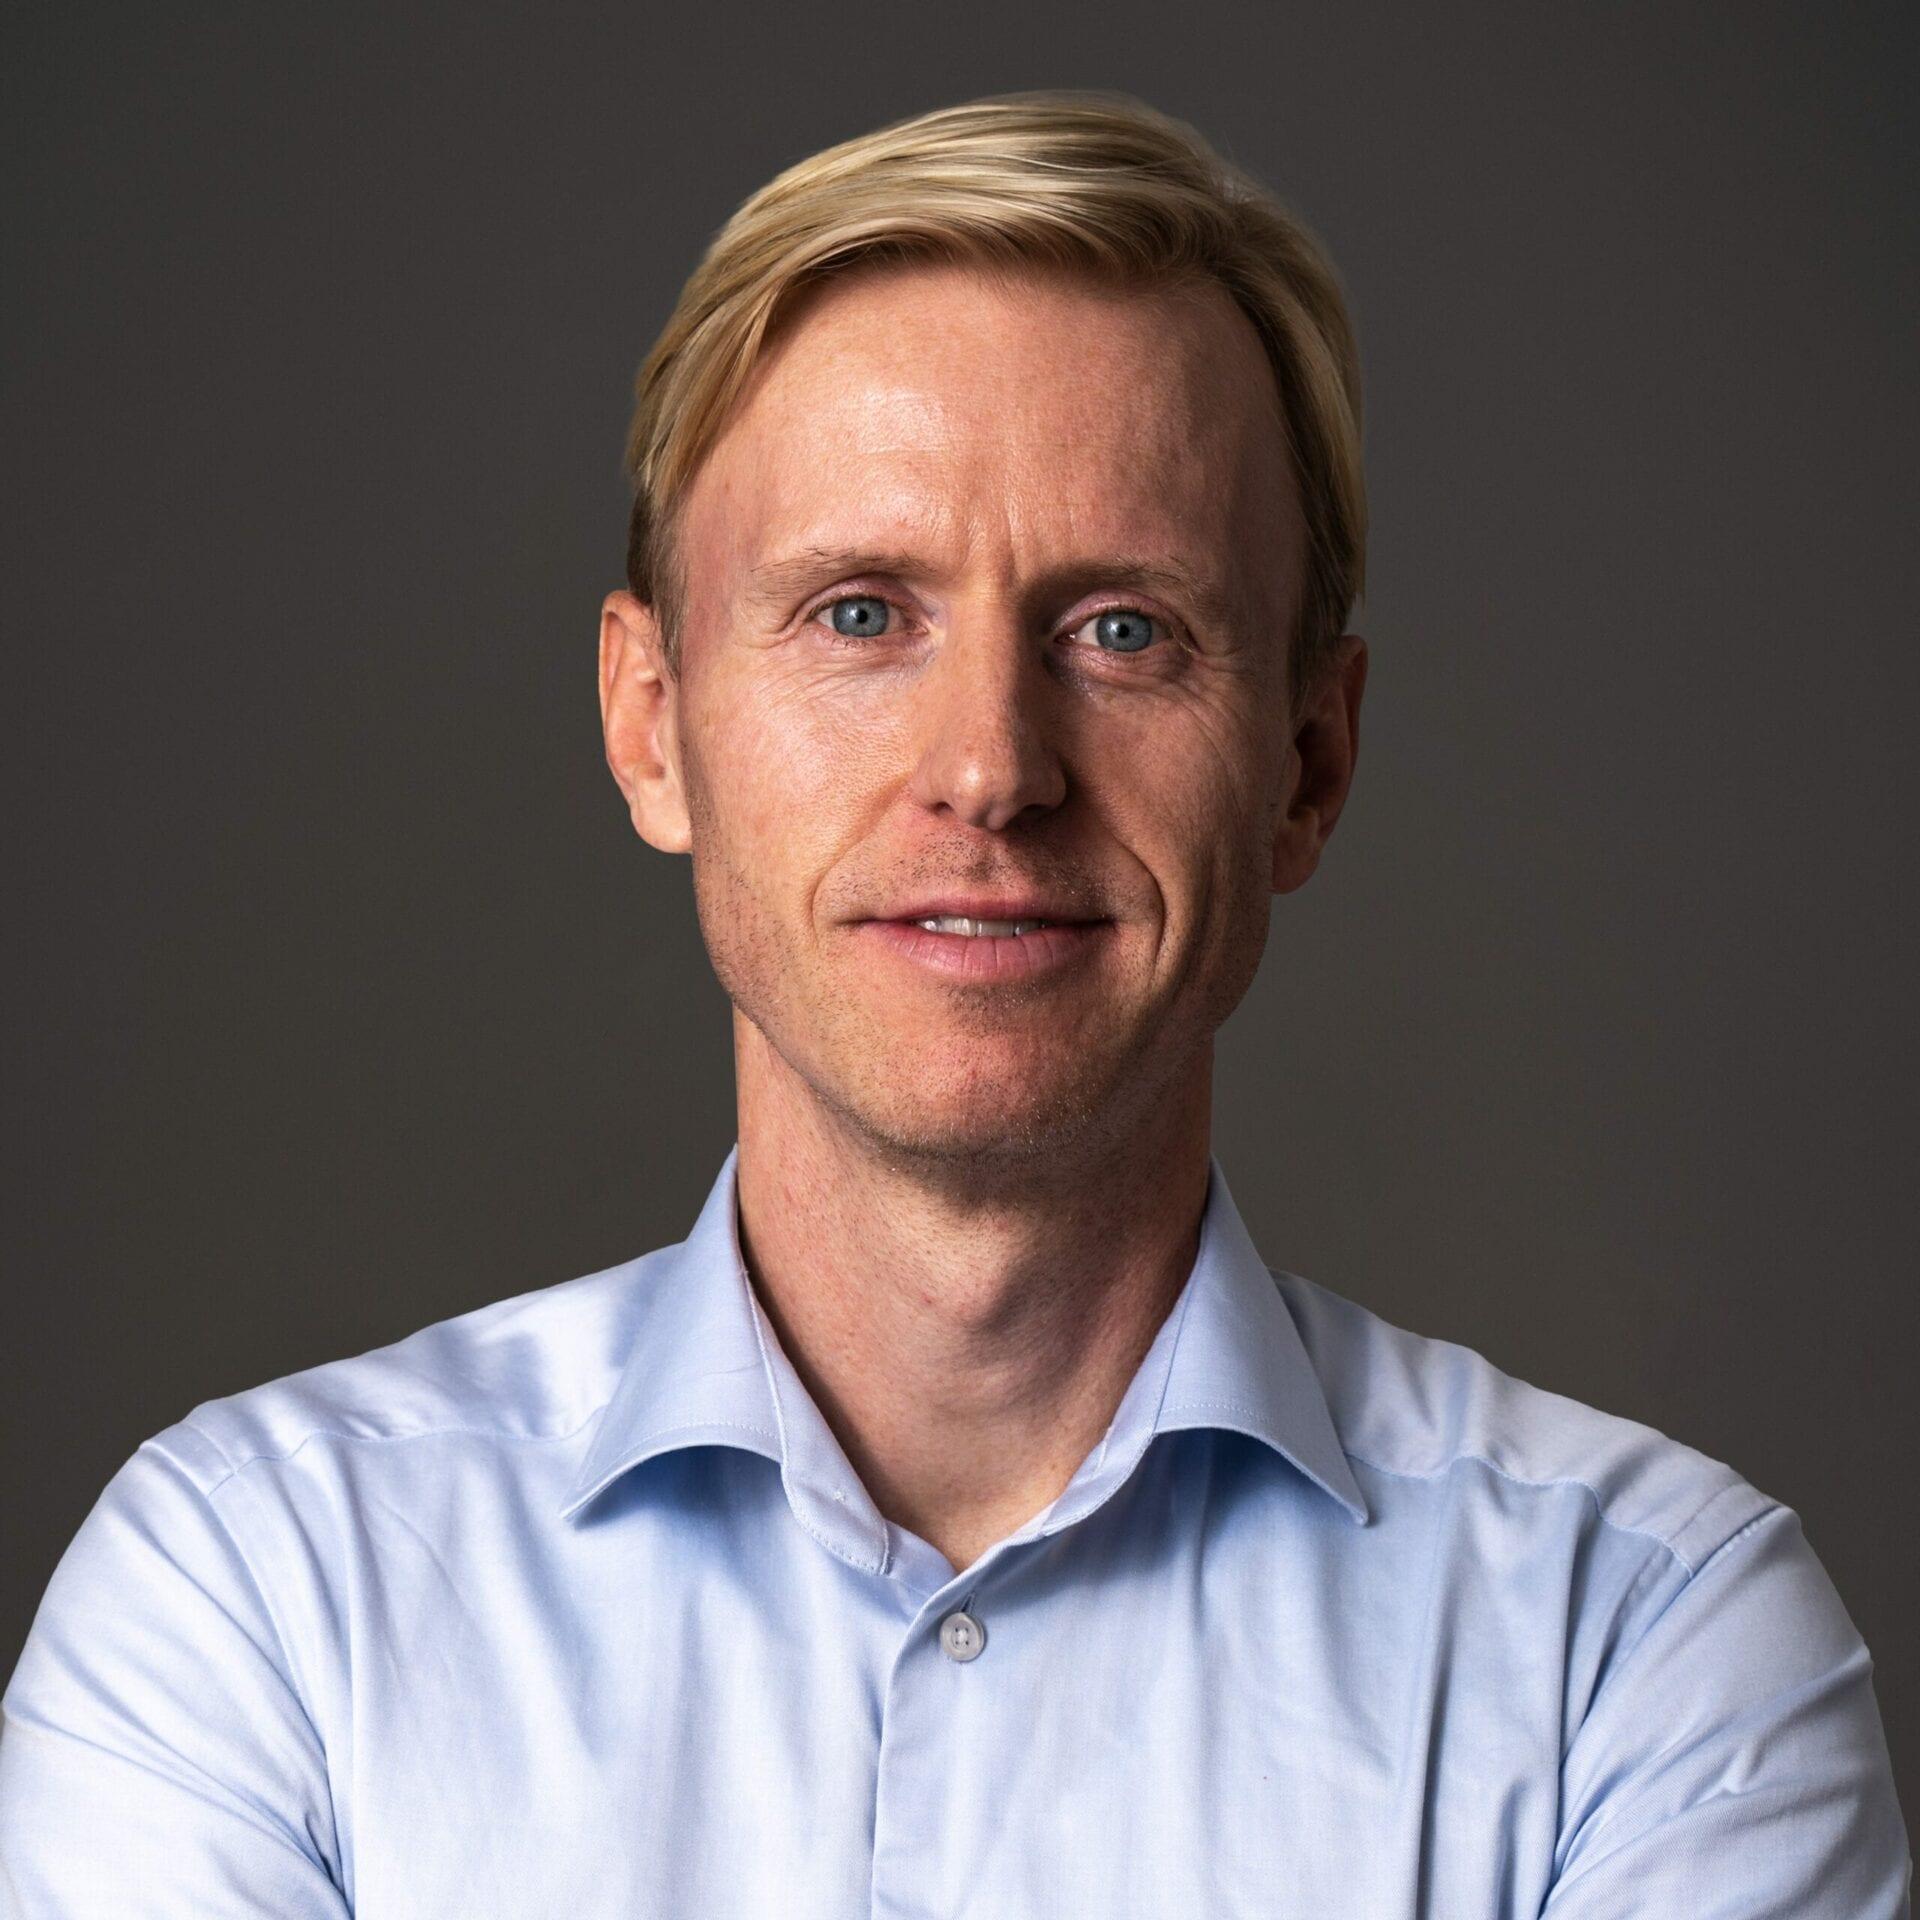 Henrik Seeberg